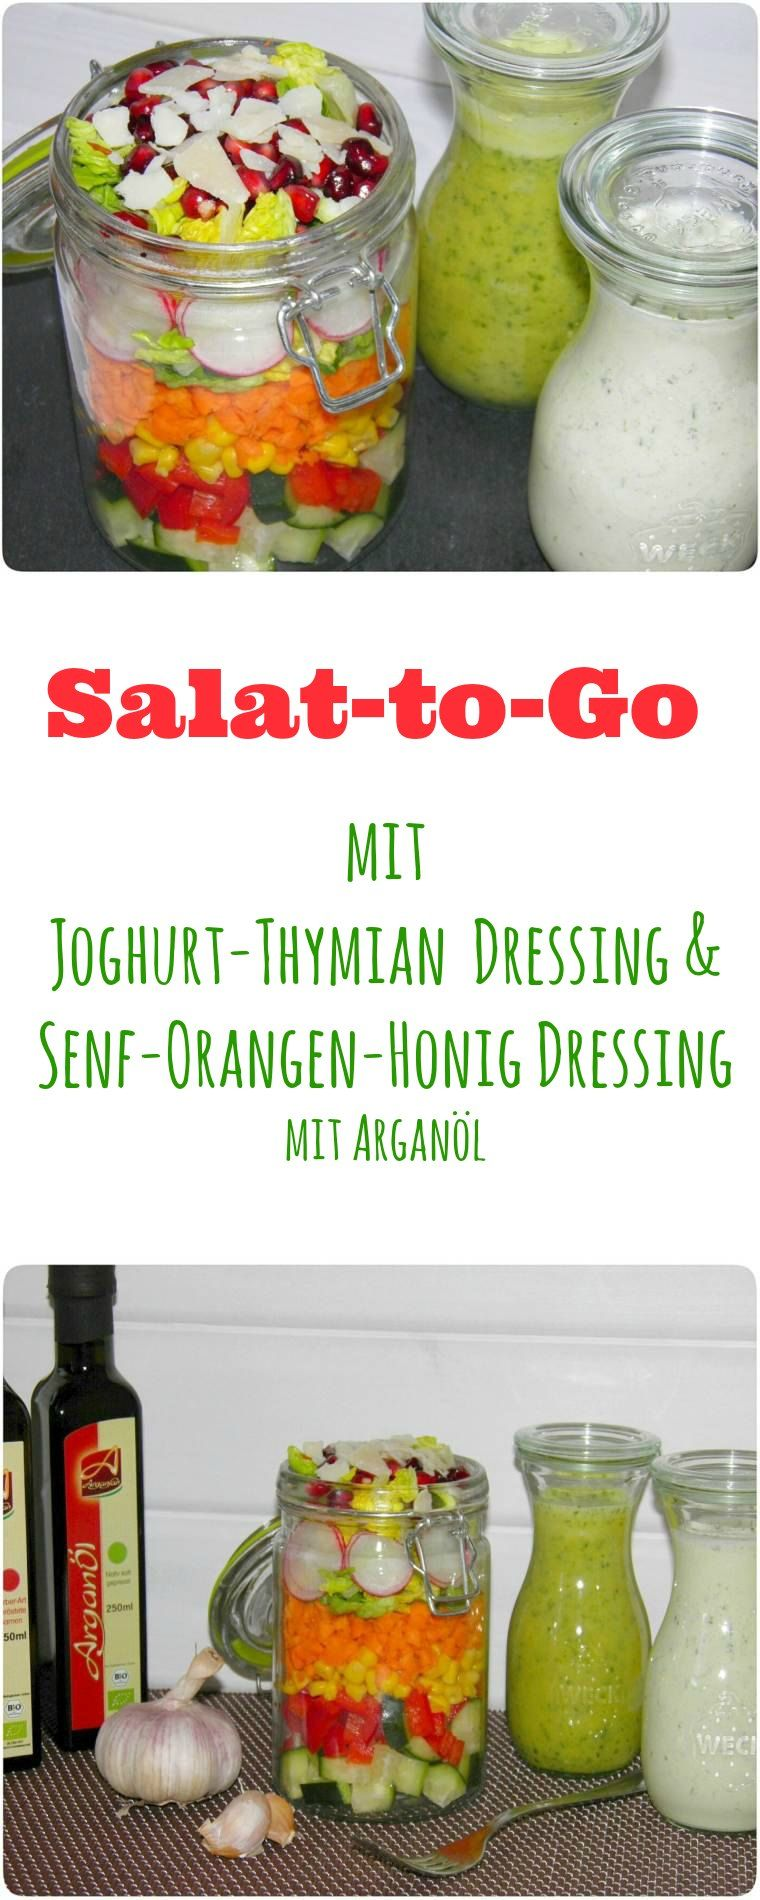 joghurt thymian dressing senf orangen honig dressing recipe blogger partyrezepte. Black Bedroom Furniture Sets. Home Design Ideas